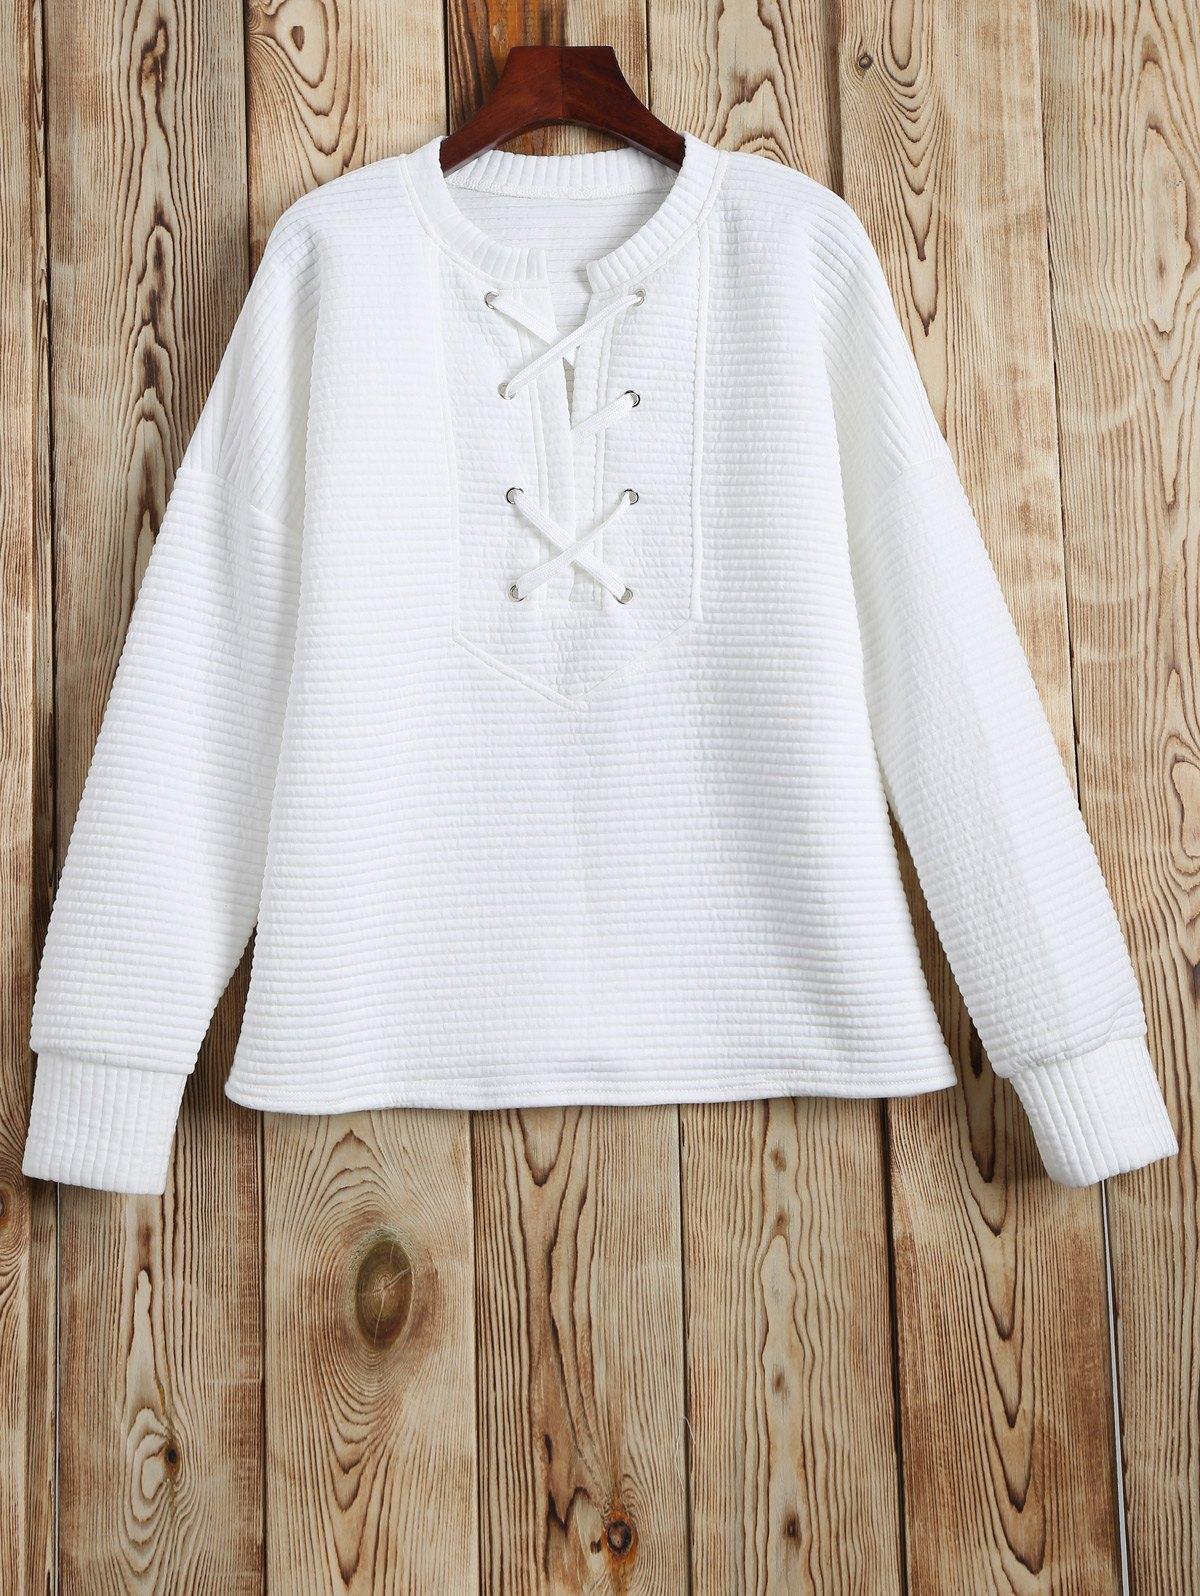 Round Neck Lace Up Sweatshirt